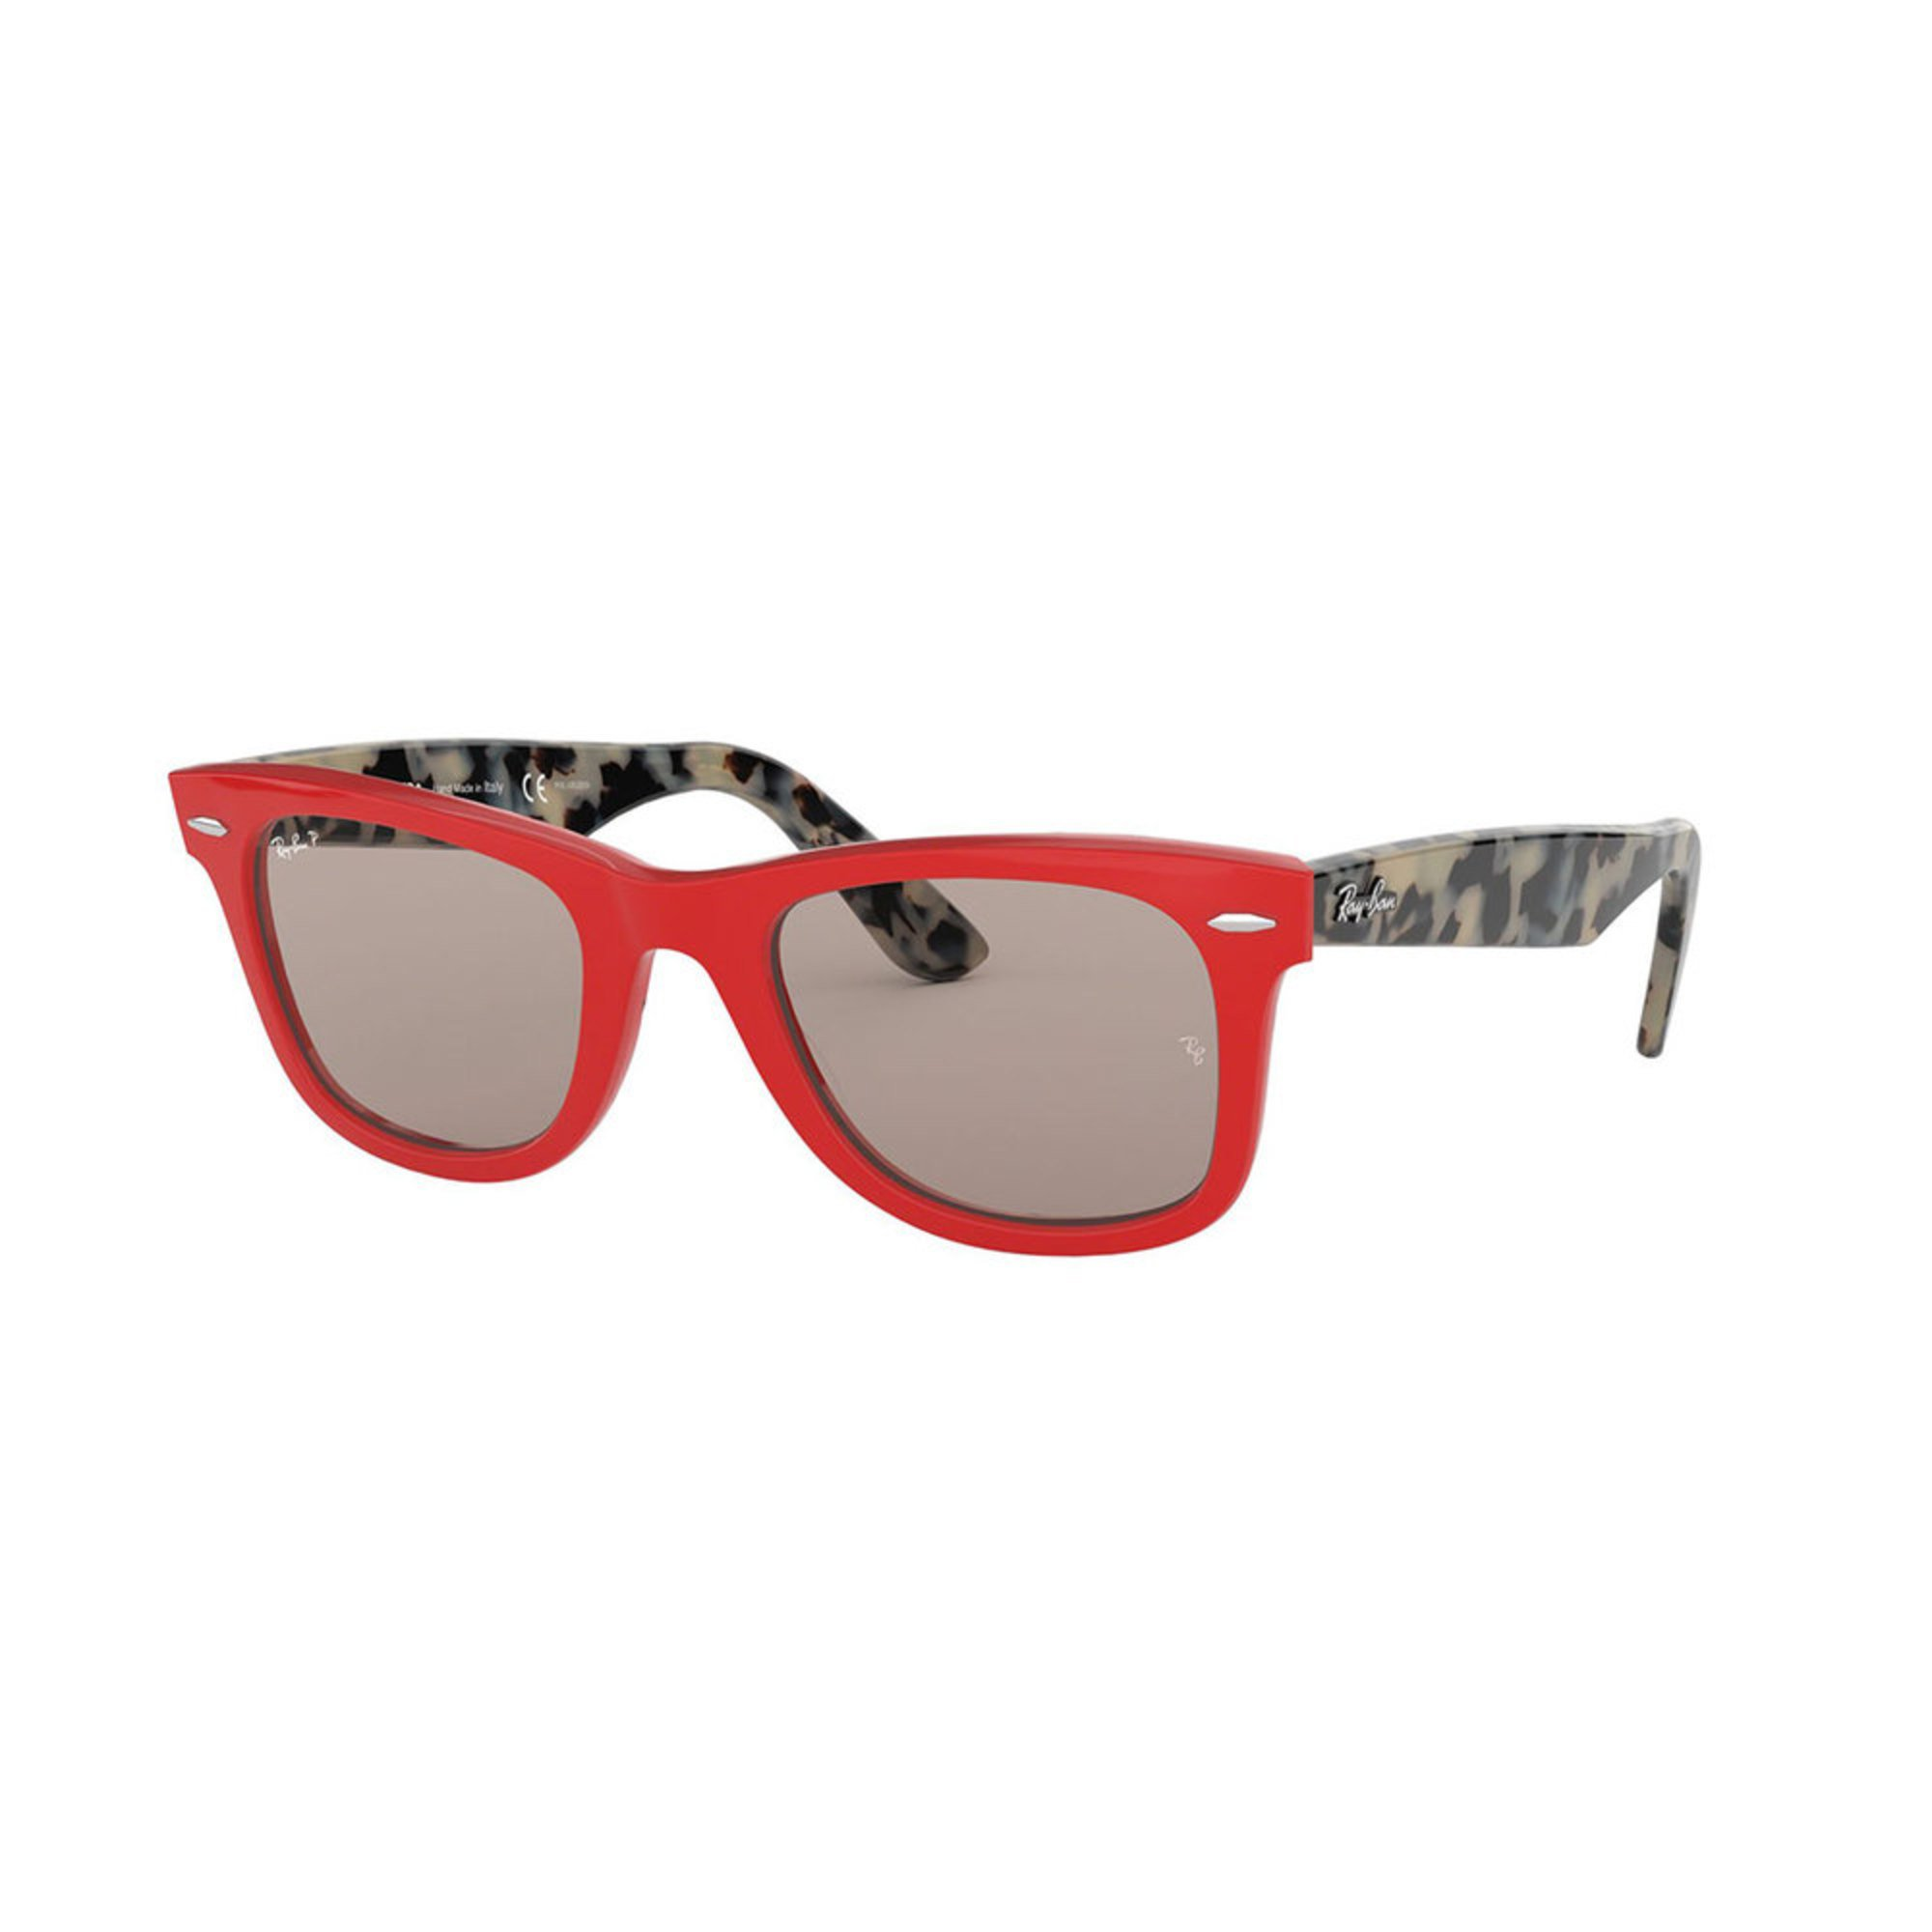 07ffd5e3f78dc ... italy rayban unisex original wayfarer red grey polarized sunglasses  50mm bde9c 14b51